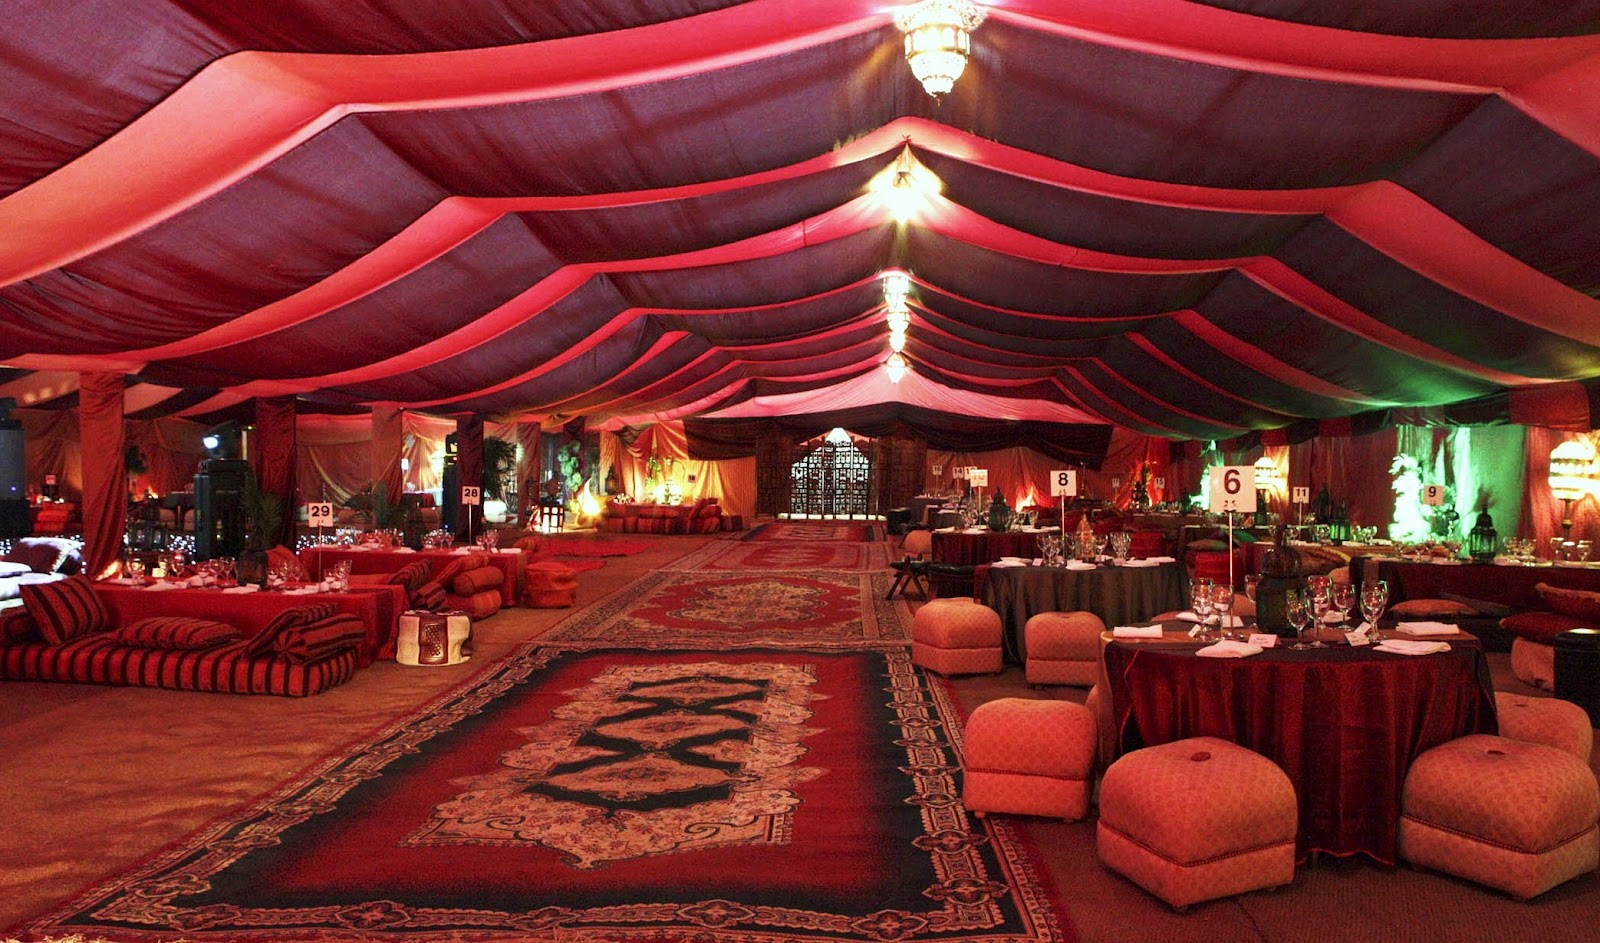 Wedding decor wedding tent decorating ideas wedding tent junglespirit Gallery